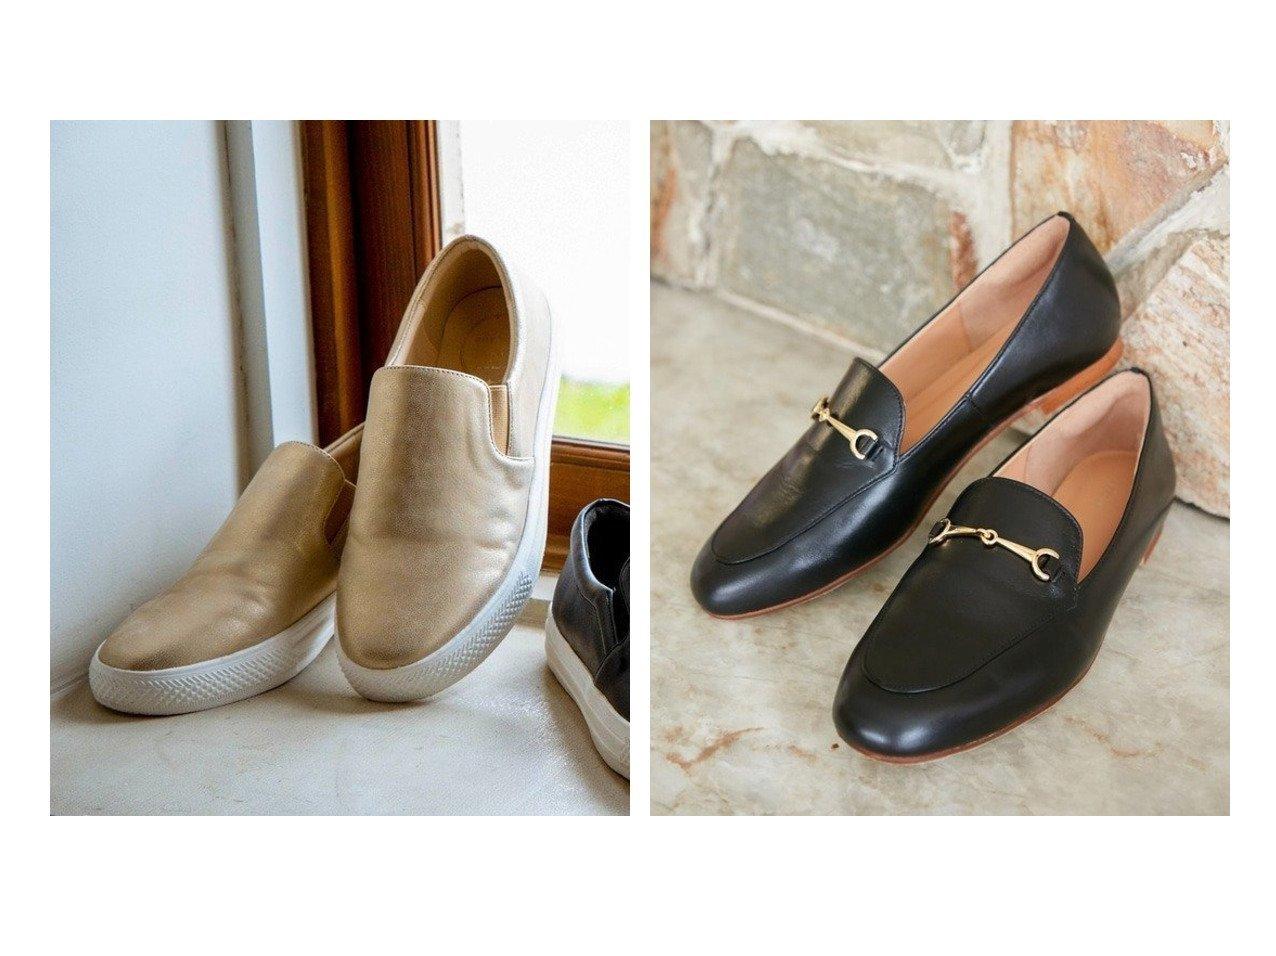 【J.PRESS/ジェイ プレス】の【足をサポートする8機能有】ビットローファー シューズ&【any SiS/エニィ スィス】のシンプルユース スリッポン スニーカー シューズ・靴のおすすめ!人気、トレンド・レディースファッションの通販  おすすめで人気の流行・トレンド、ファッションの通販商品 メンズファッション・キッズファッション・インテリア・家具・レディースファッション・服の通販 founy(ファニー) https://founy.com/ ファッション Fashion レディースファッション WOMEN 送料無料 Free Shipping シンプル スニーカー スリッポン フェミニン 再入荷 Restock/Back in Stock/Re Arrival クッション シューズ フィット マニッシュ ライニング NEW・新作・新着・新入荷 New Arrivals |ID:crp329100000009859